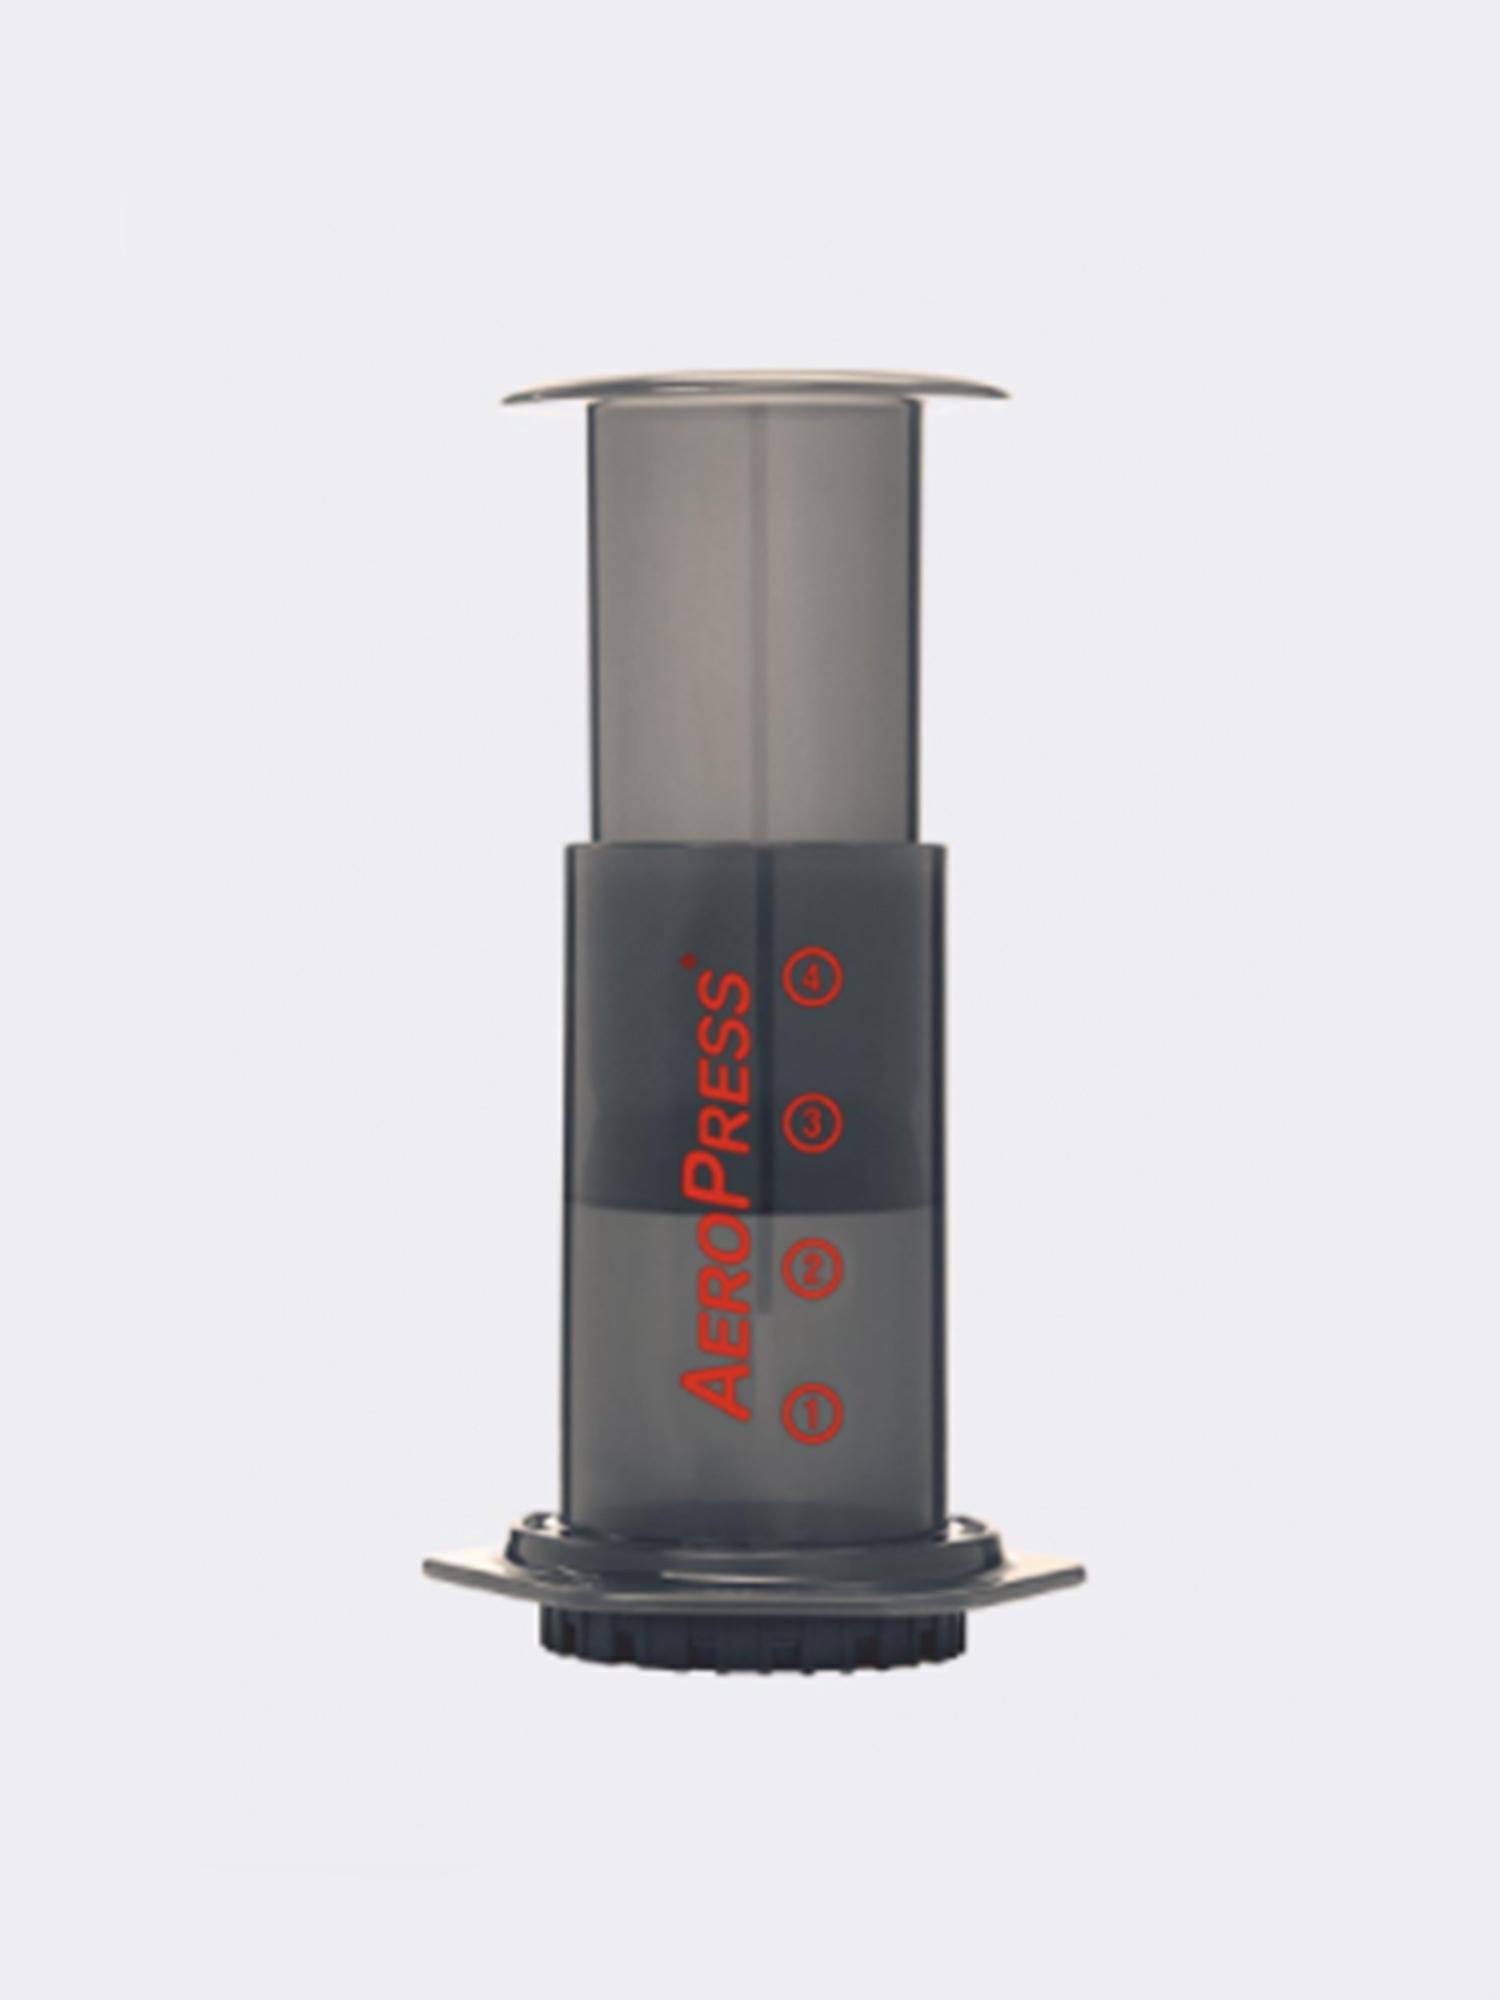 AeroPress Coffee Press Espresso Maker-3